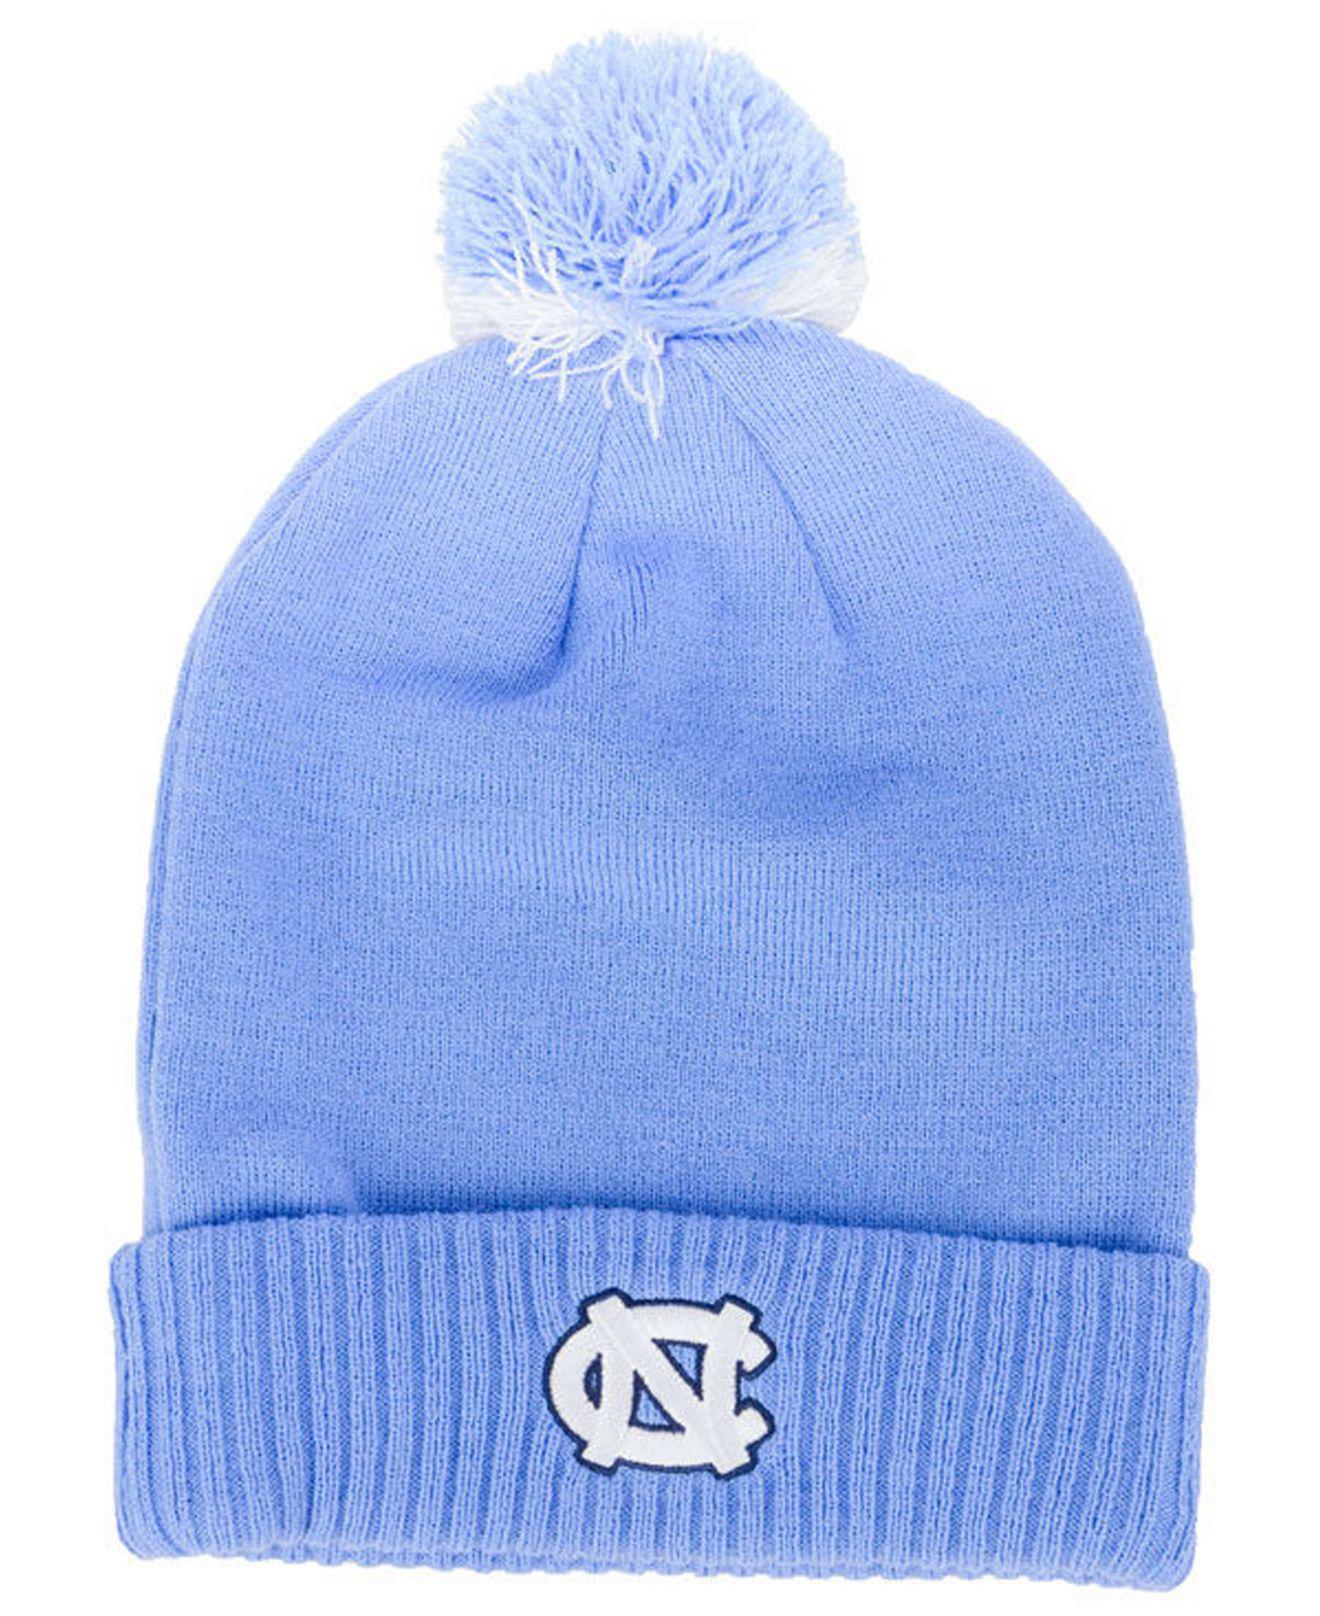 online store a72bd 14330 Lyst - Nike North Carolina Tar Heels Beanie Sideline Pom in Blue